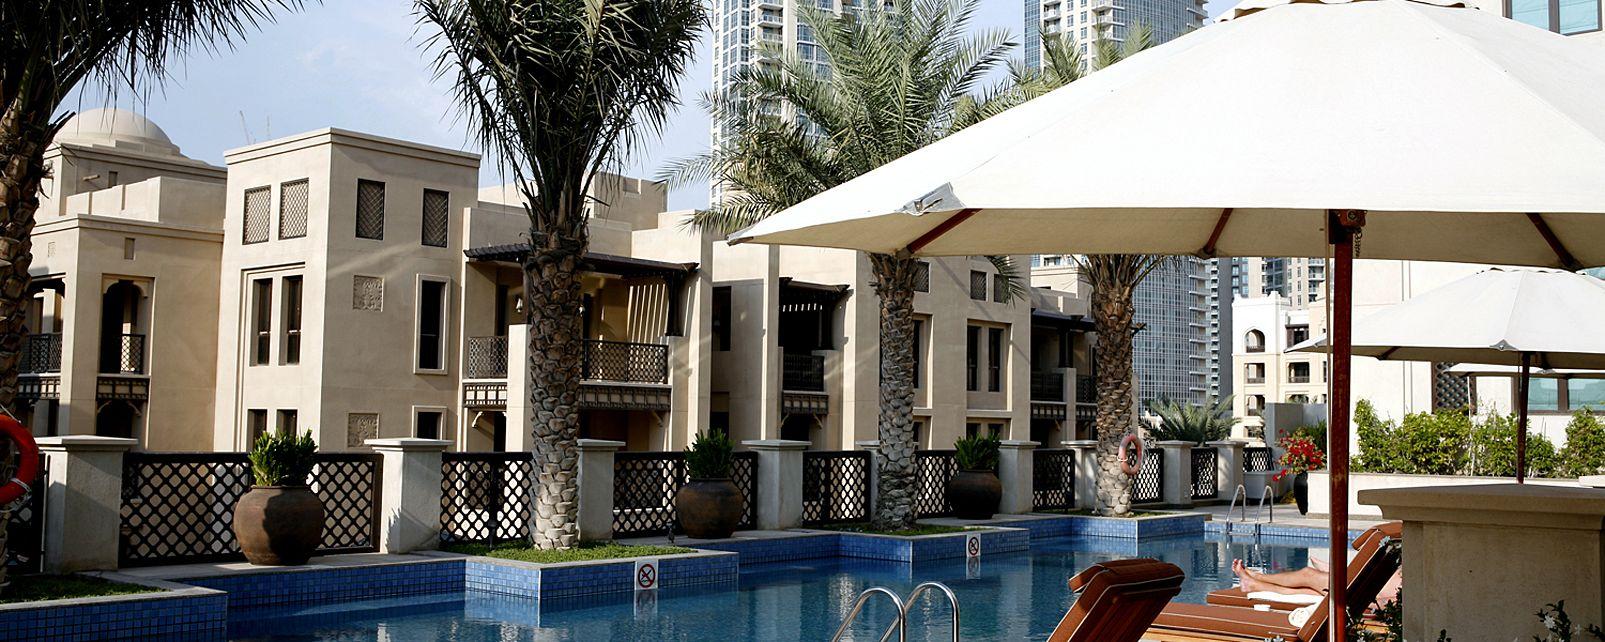 Hôtel Al Manzil